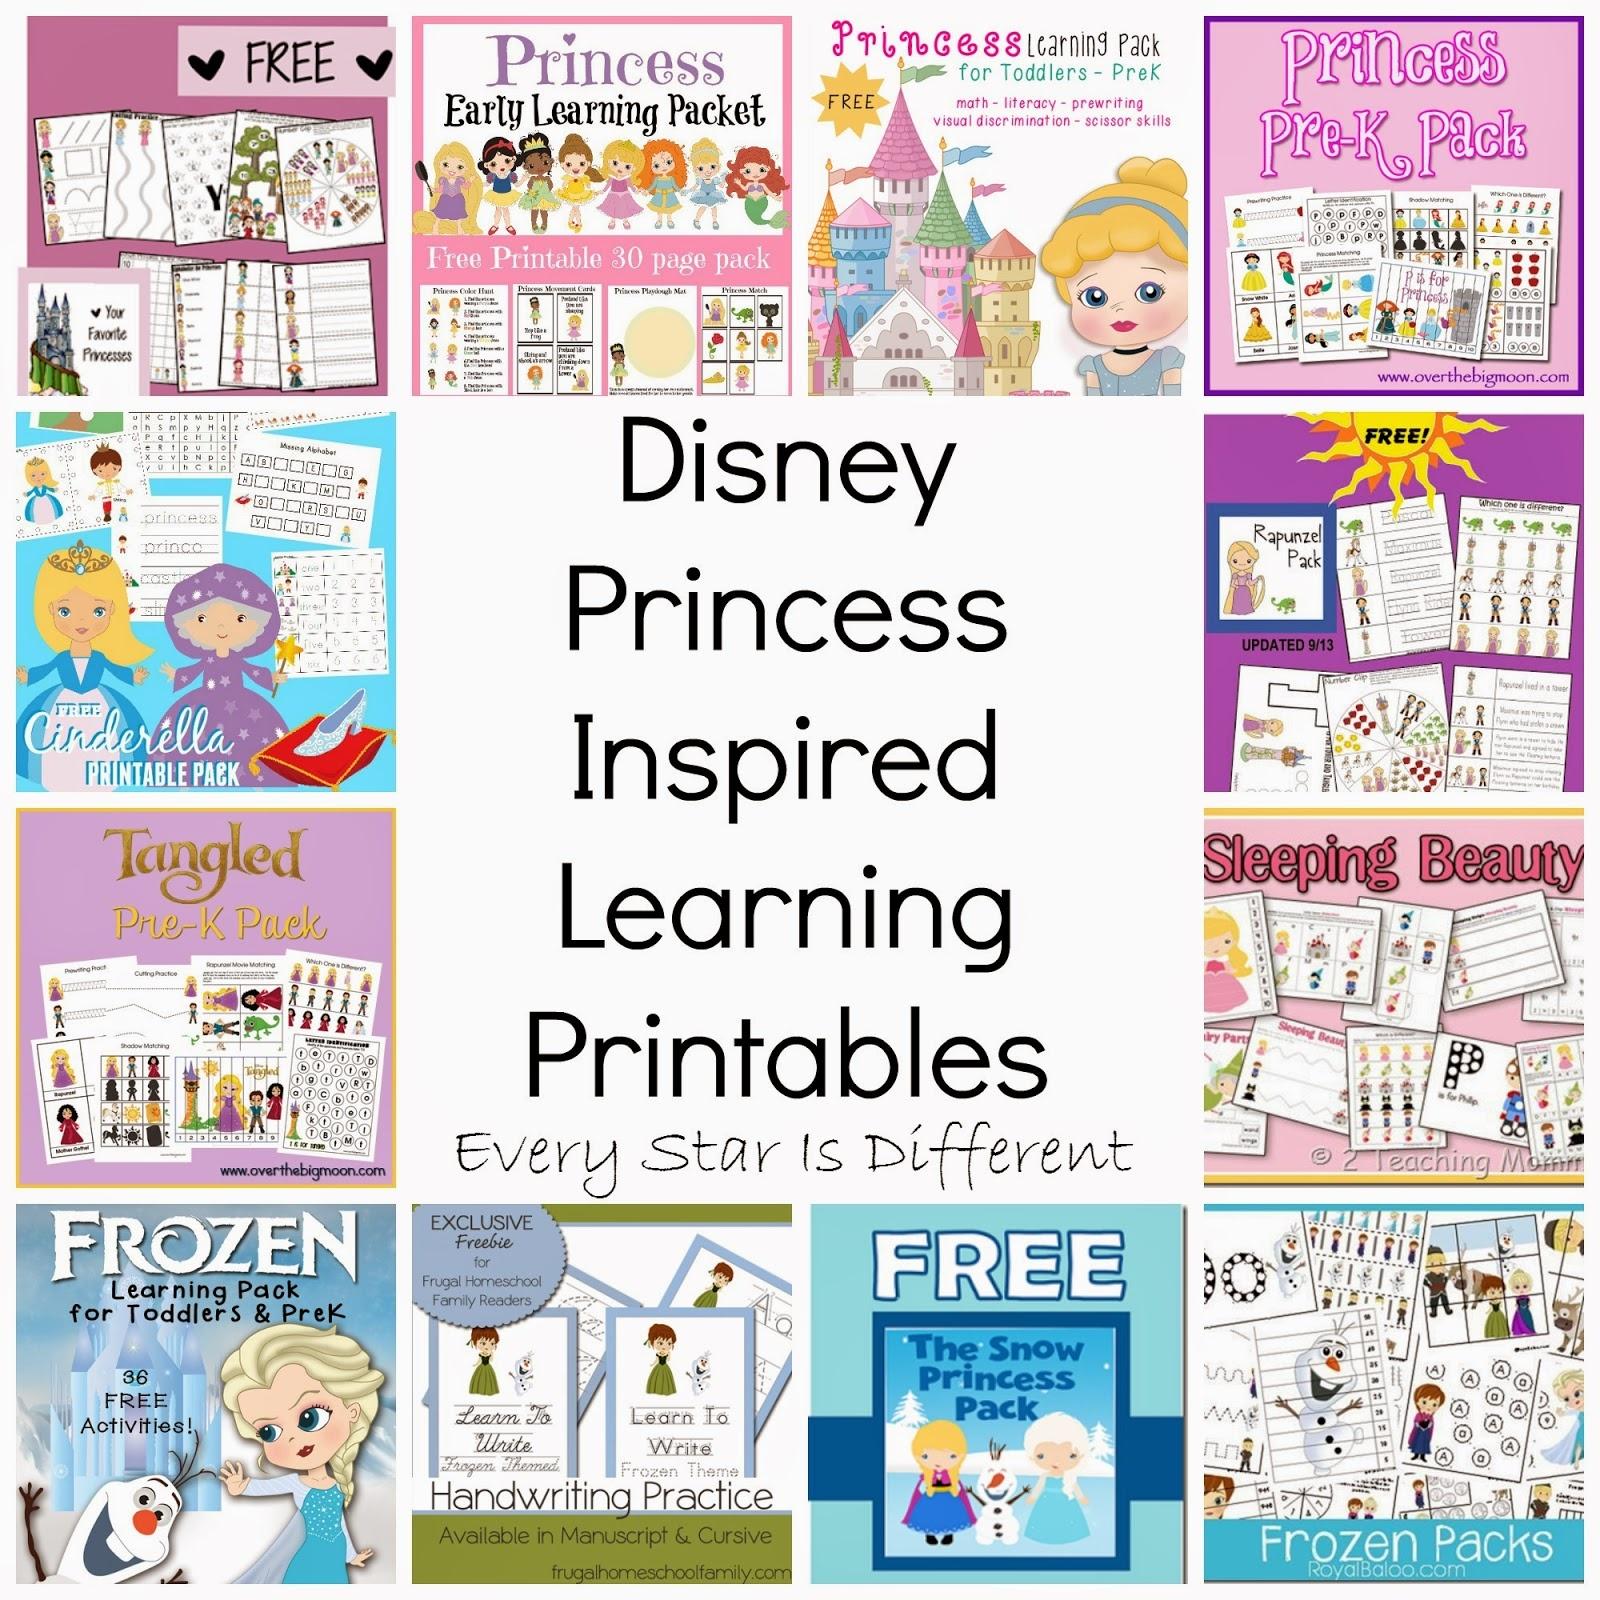 Disney Printable Worksheets - Stwbowlfest - Free Disney Activity Printables